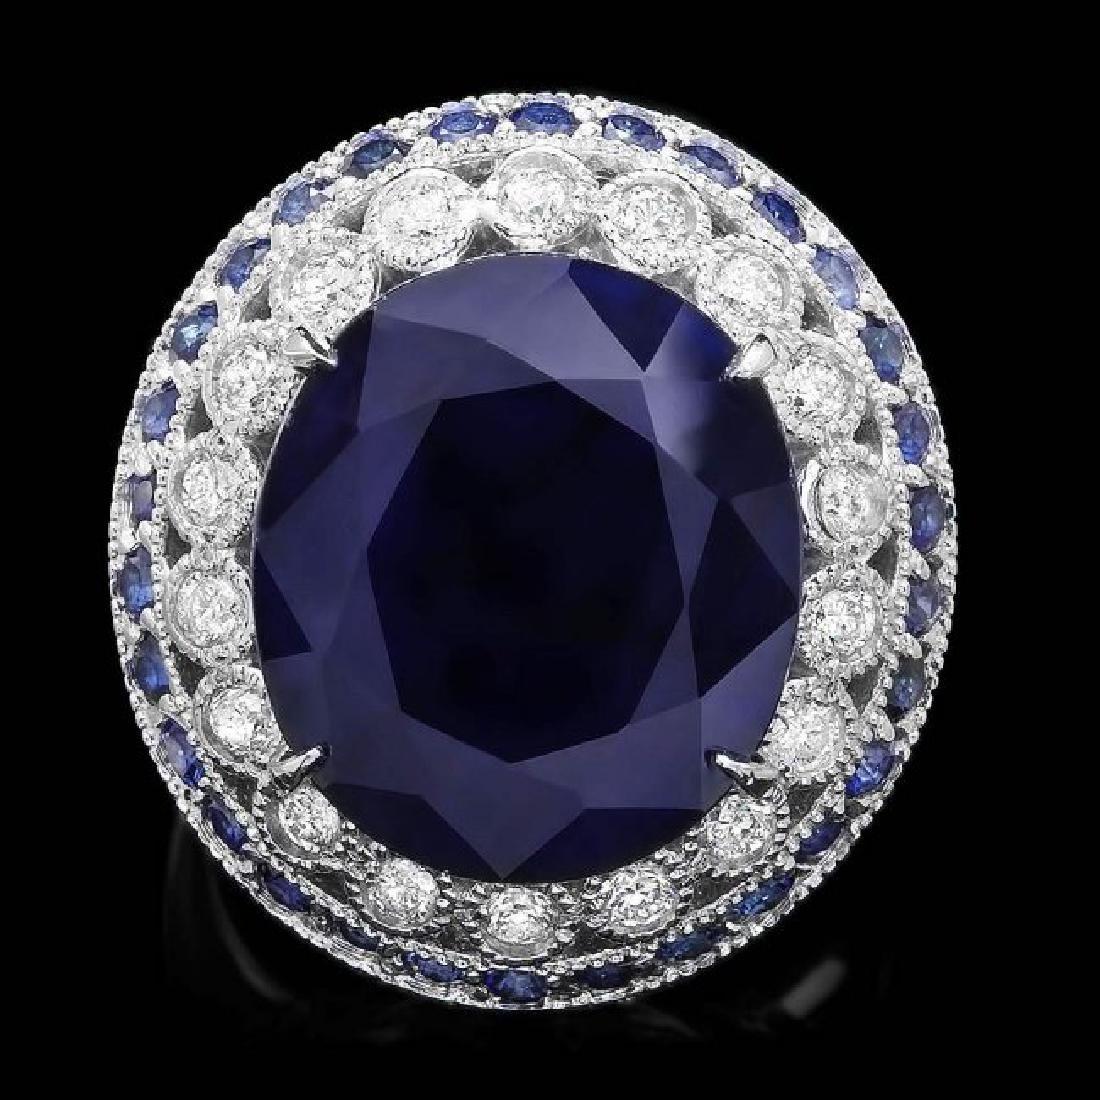 14k Gold 14.7ct Sapphire 0.80ct Diamond Ring